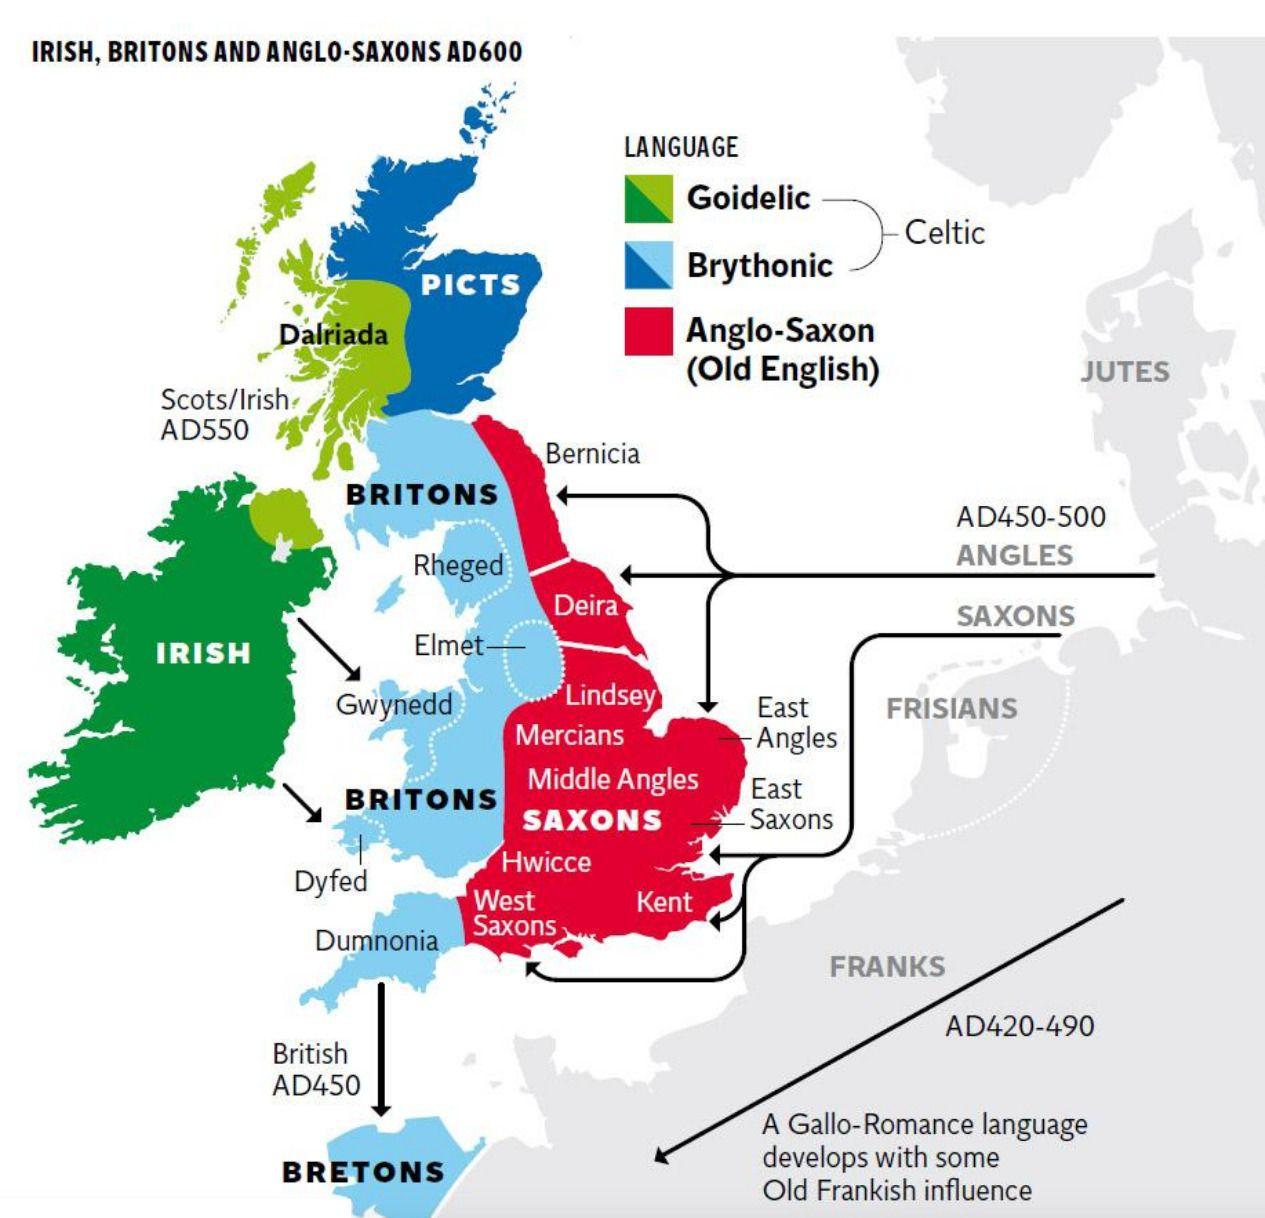 Map Of Ireland 600 Ad.Irish Britons And Anglo Saxons Ad 600 Maps Ethno Migratory